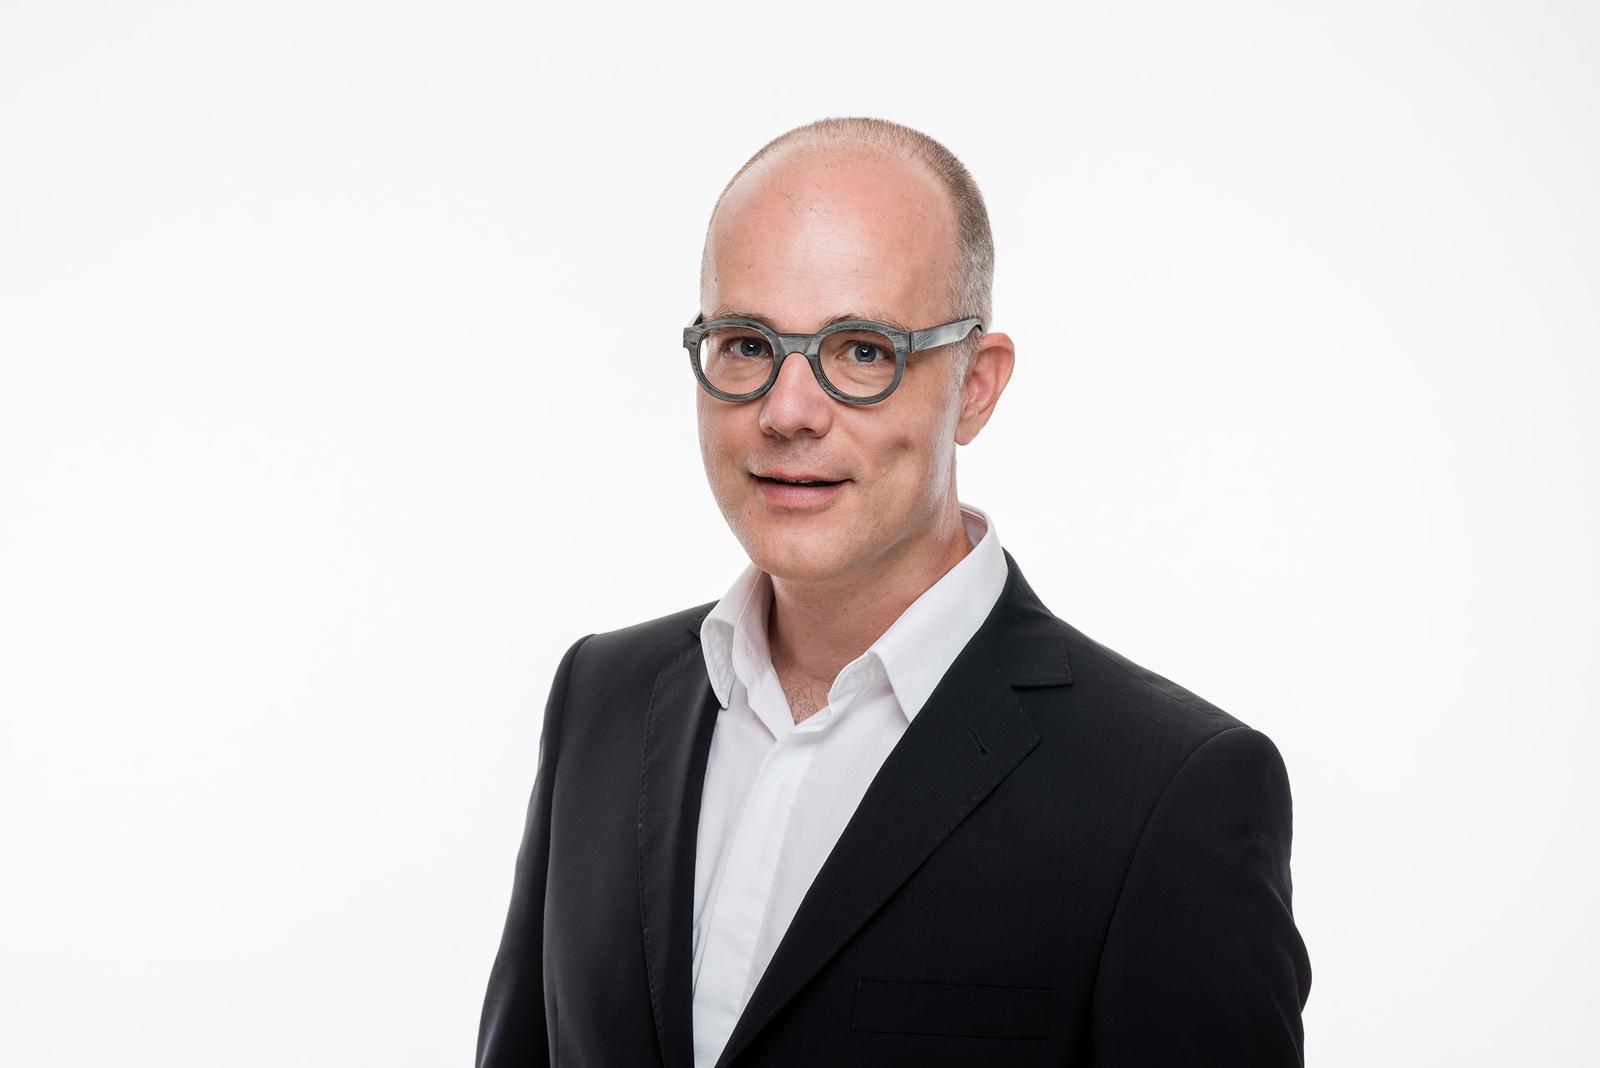 Christoph-Slupetzky-12